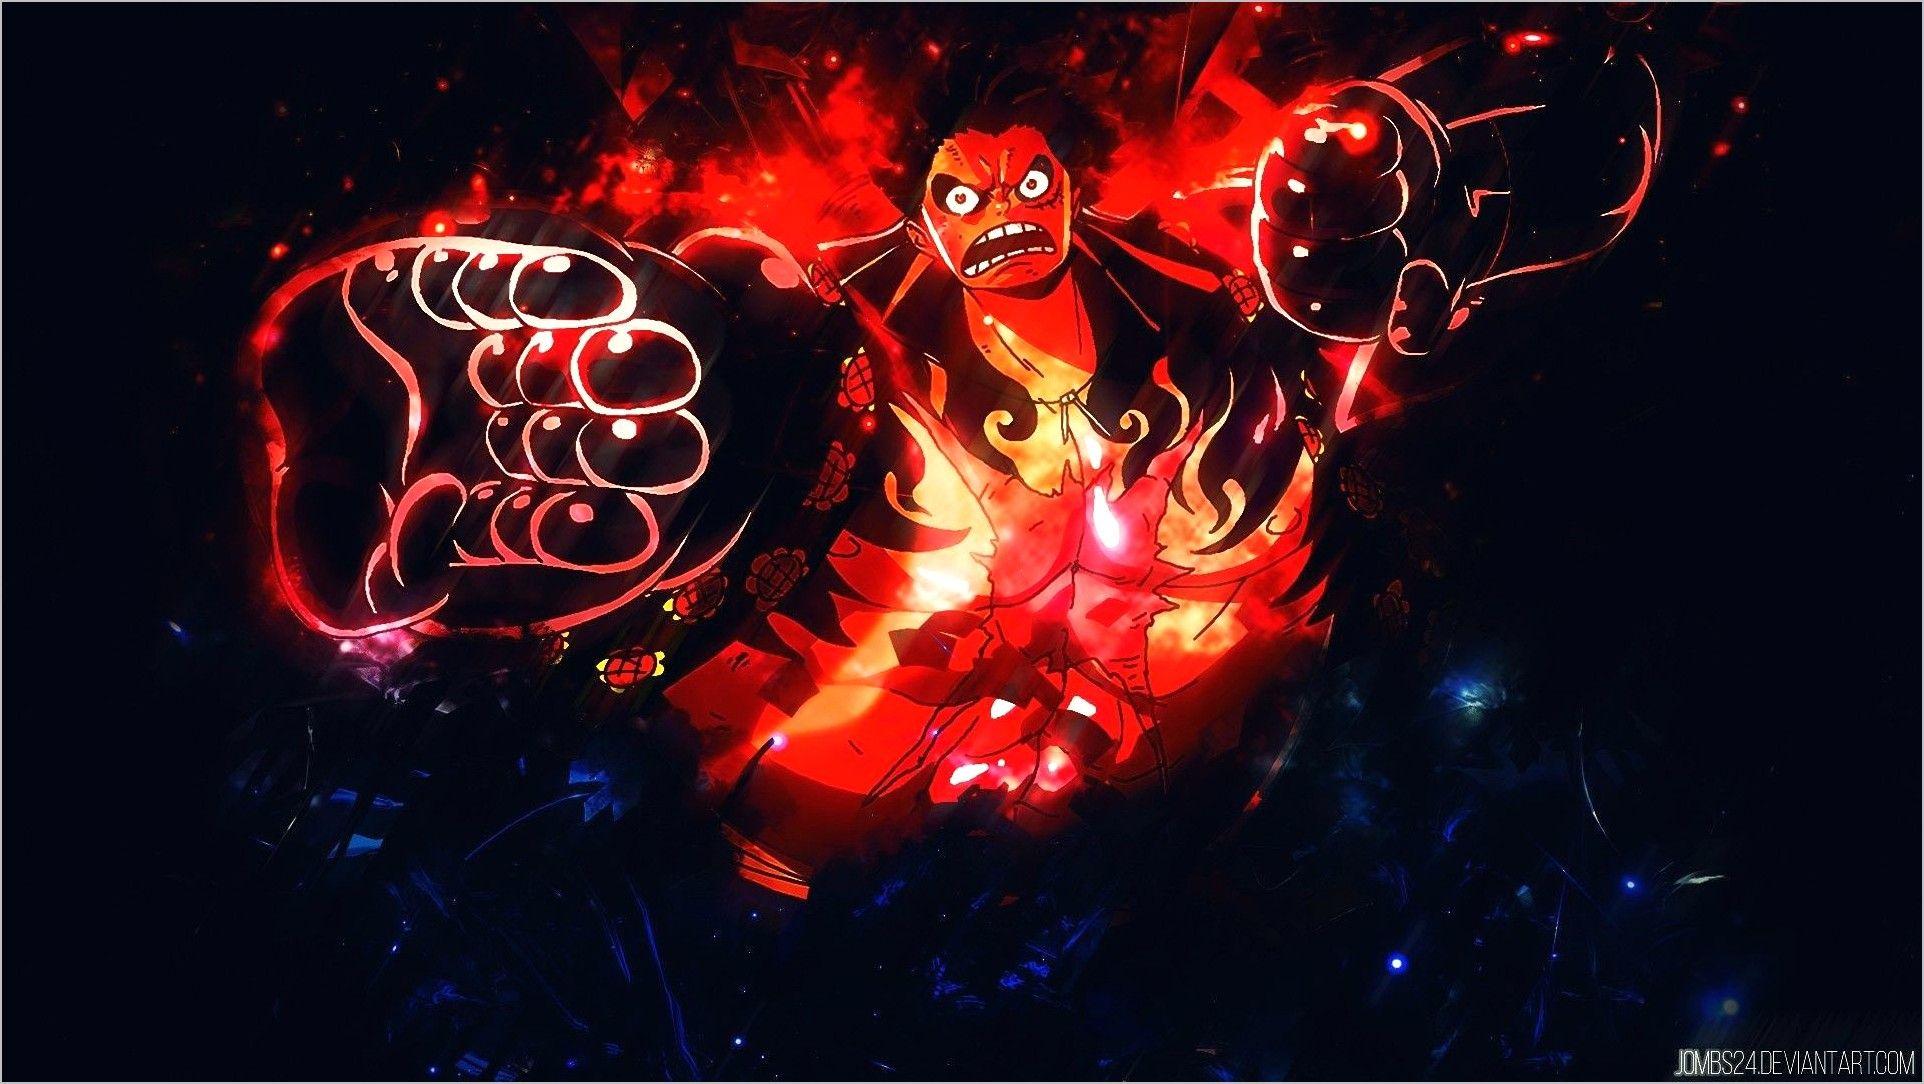 Luffy hd wallpaper background image 2496x2248 id. Luffy Snake Man Wallpaper Hd Peepsburgh